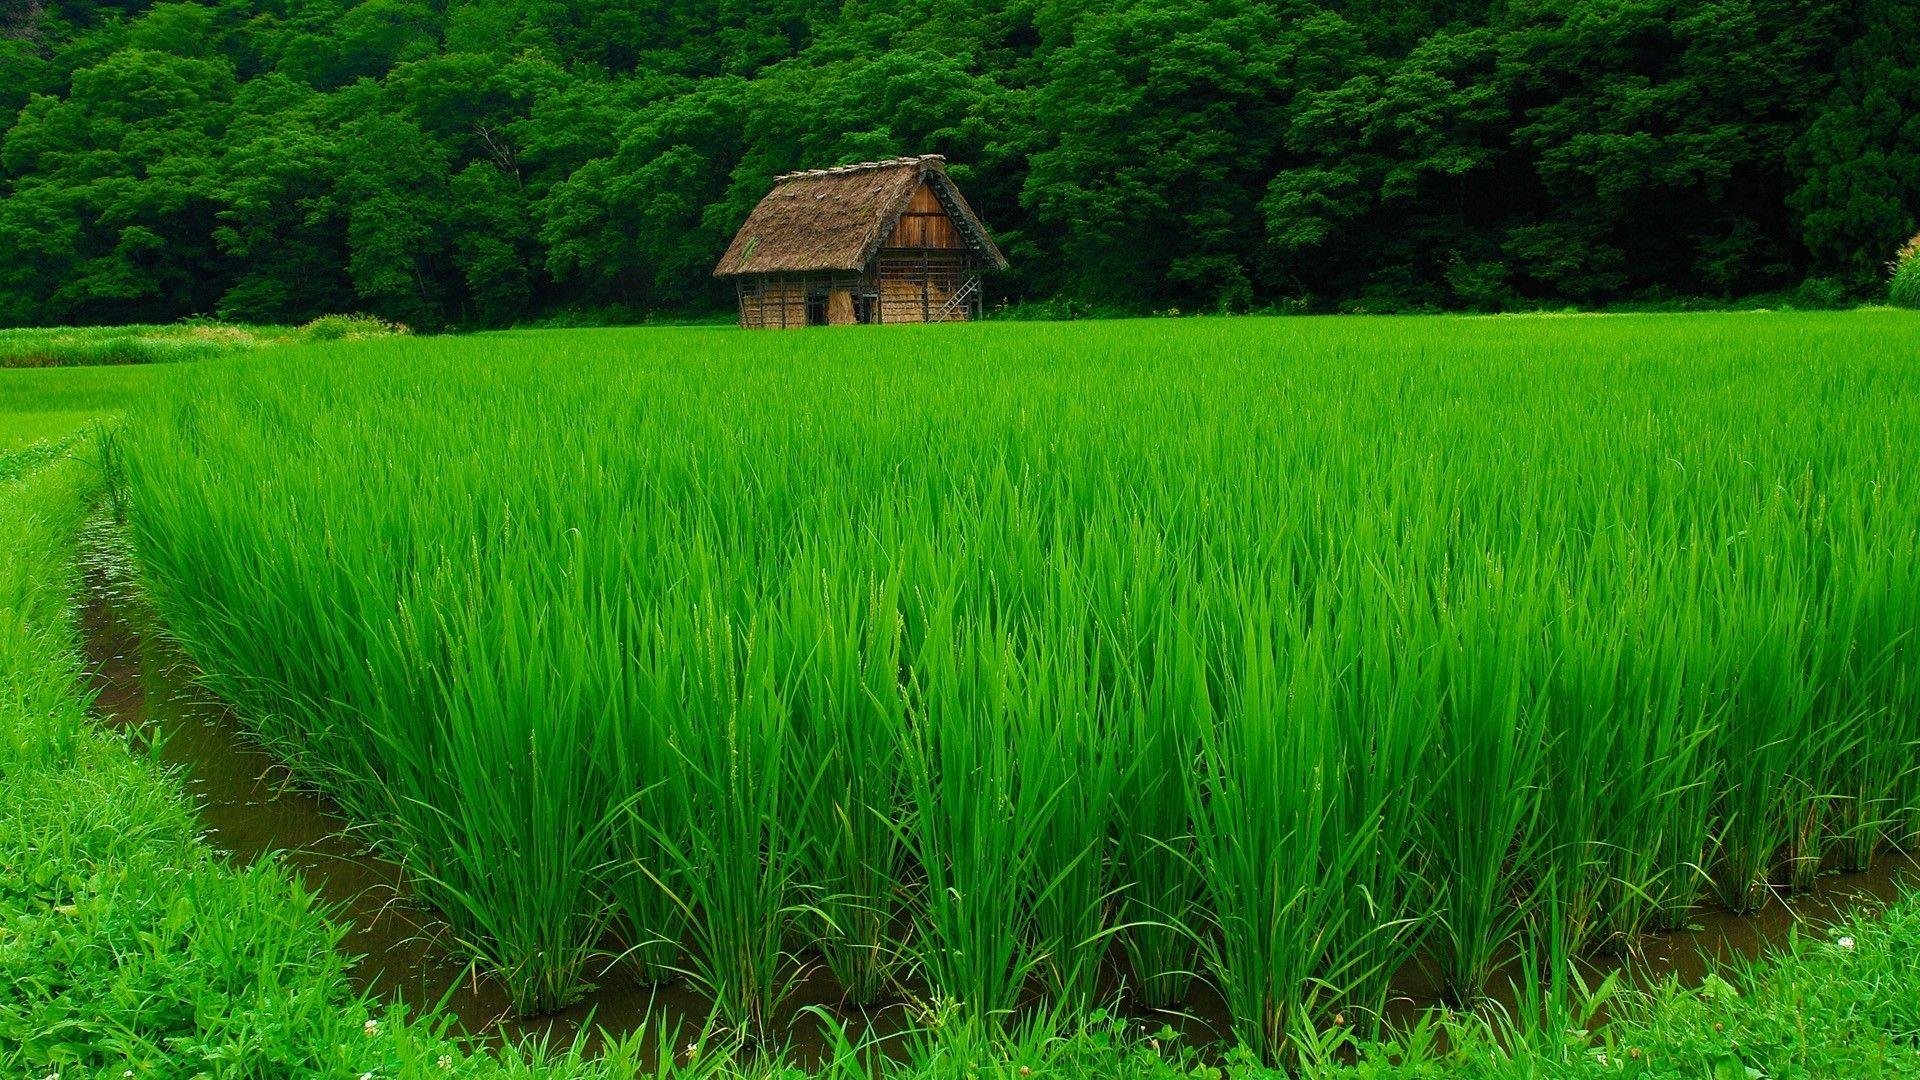 Beautiful Green Rice Field Wallpaper Green Nature Wallpaper House In Nature Field Wallpaper